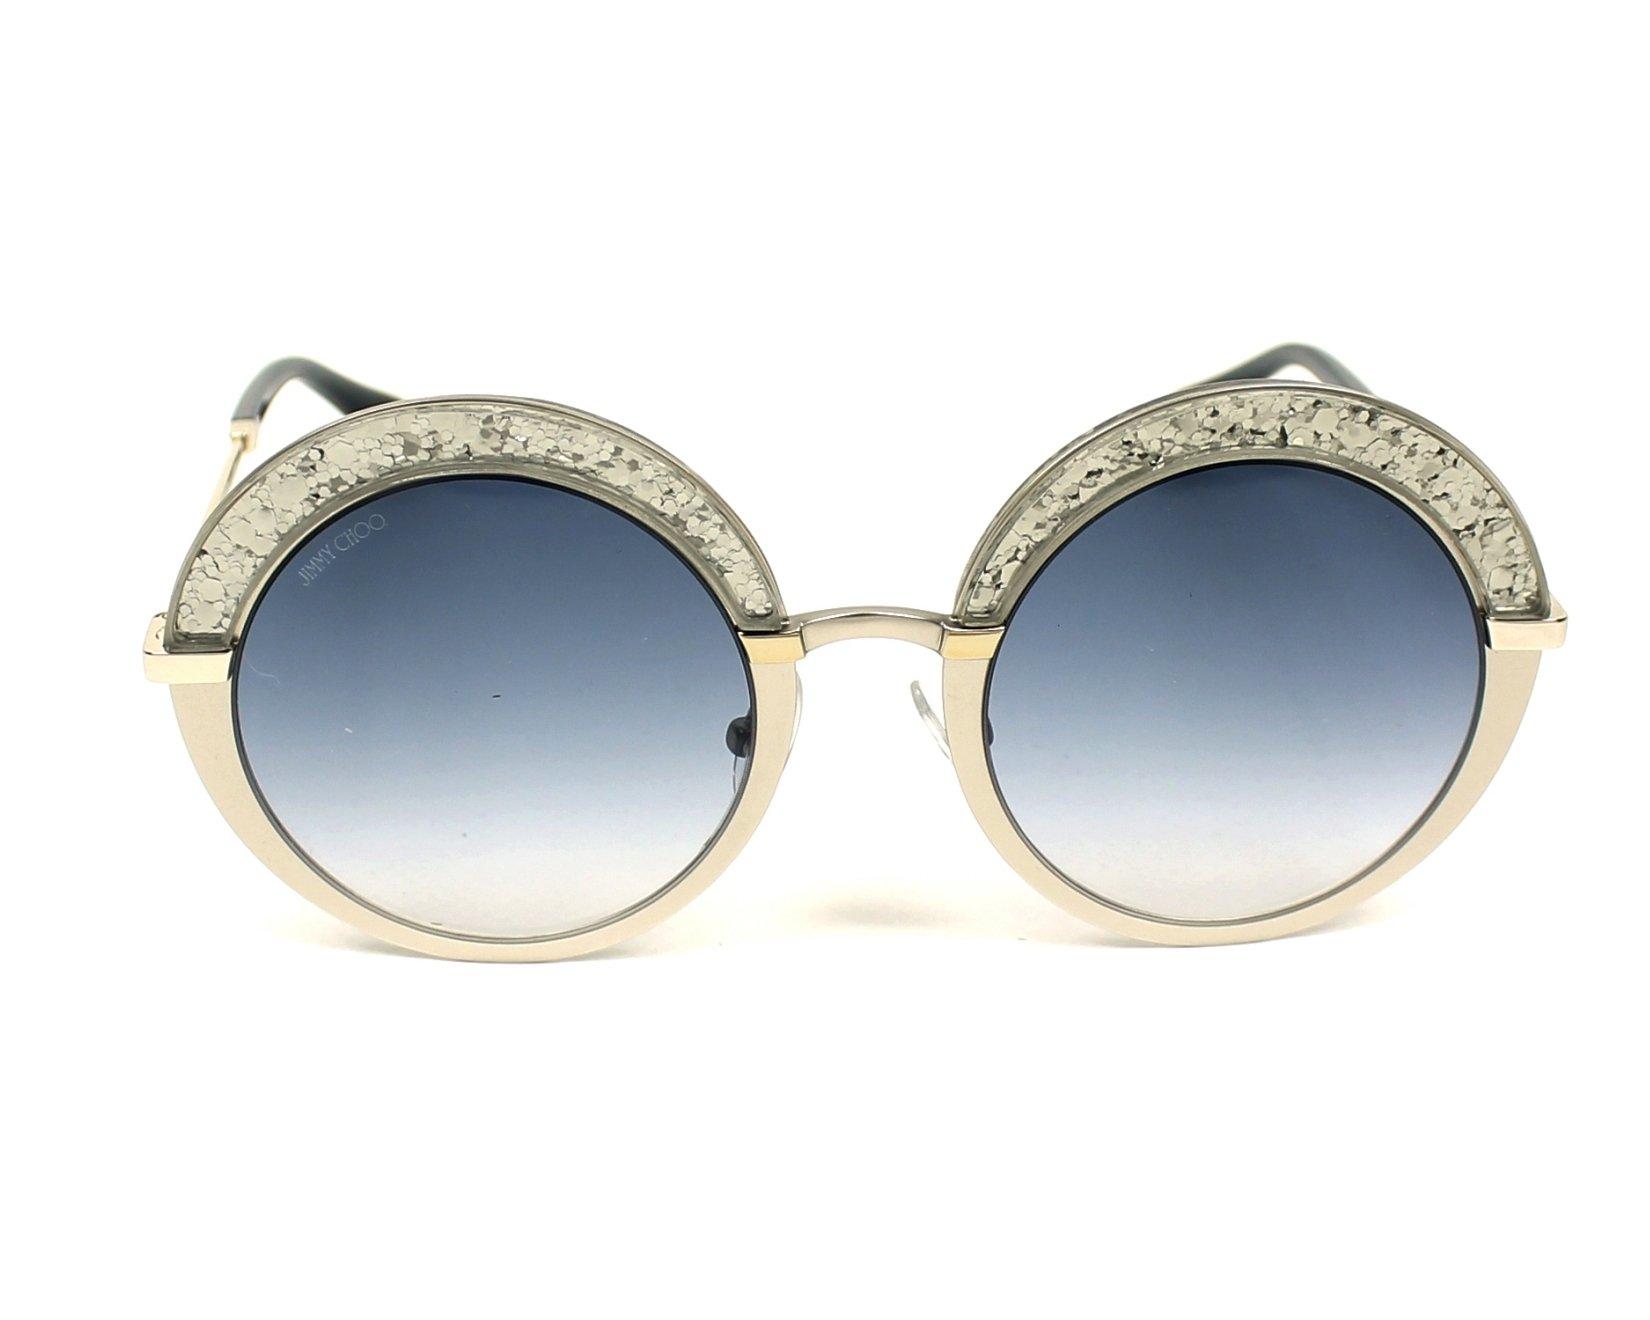 418f52485399 Sunglasses Jimmy Choo GOTHA-S 5RL KC 50-22 Silver Silver front view